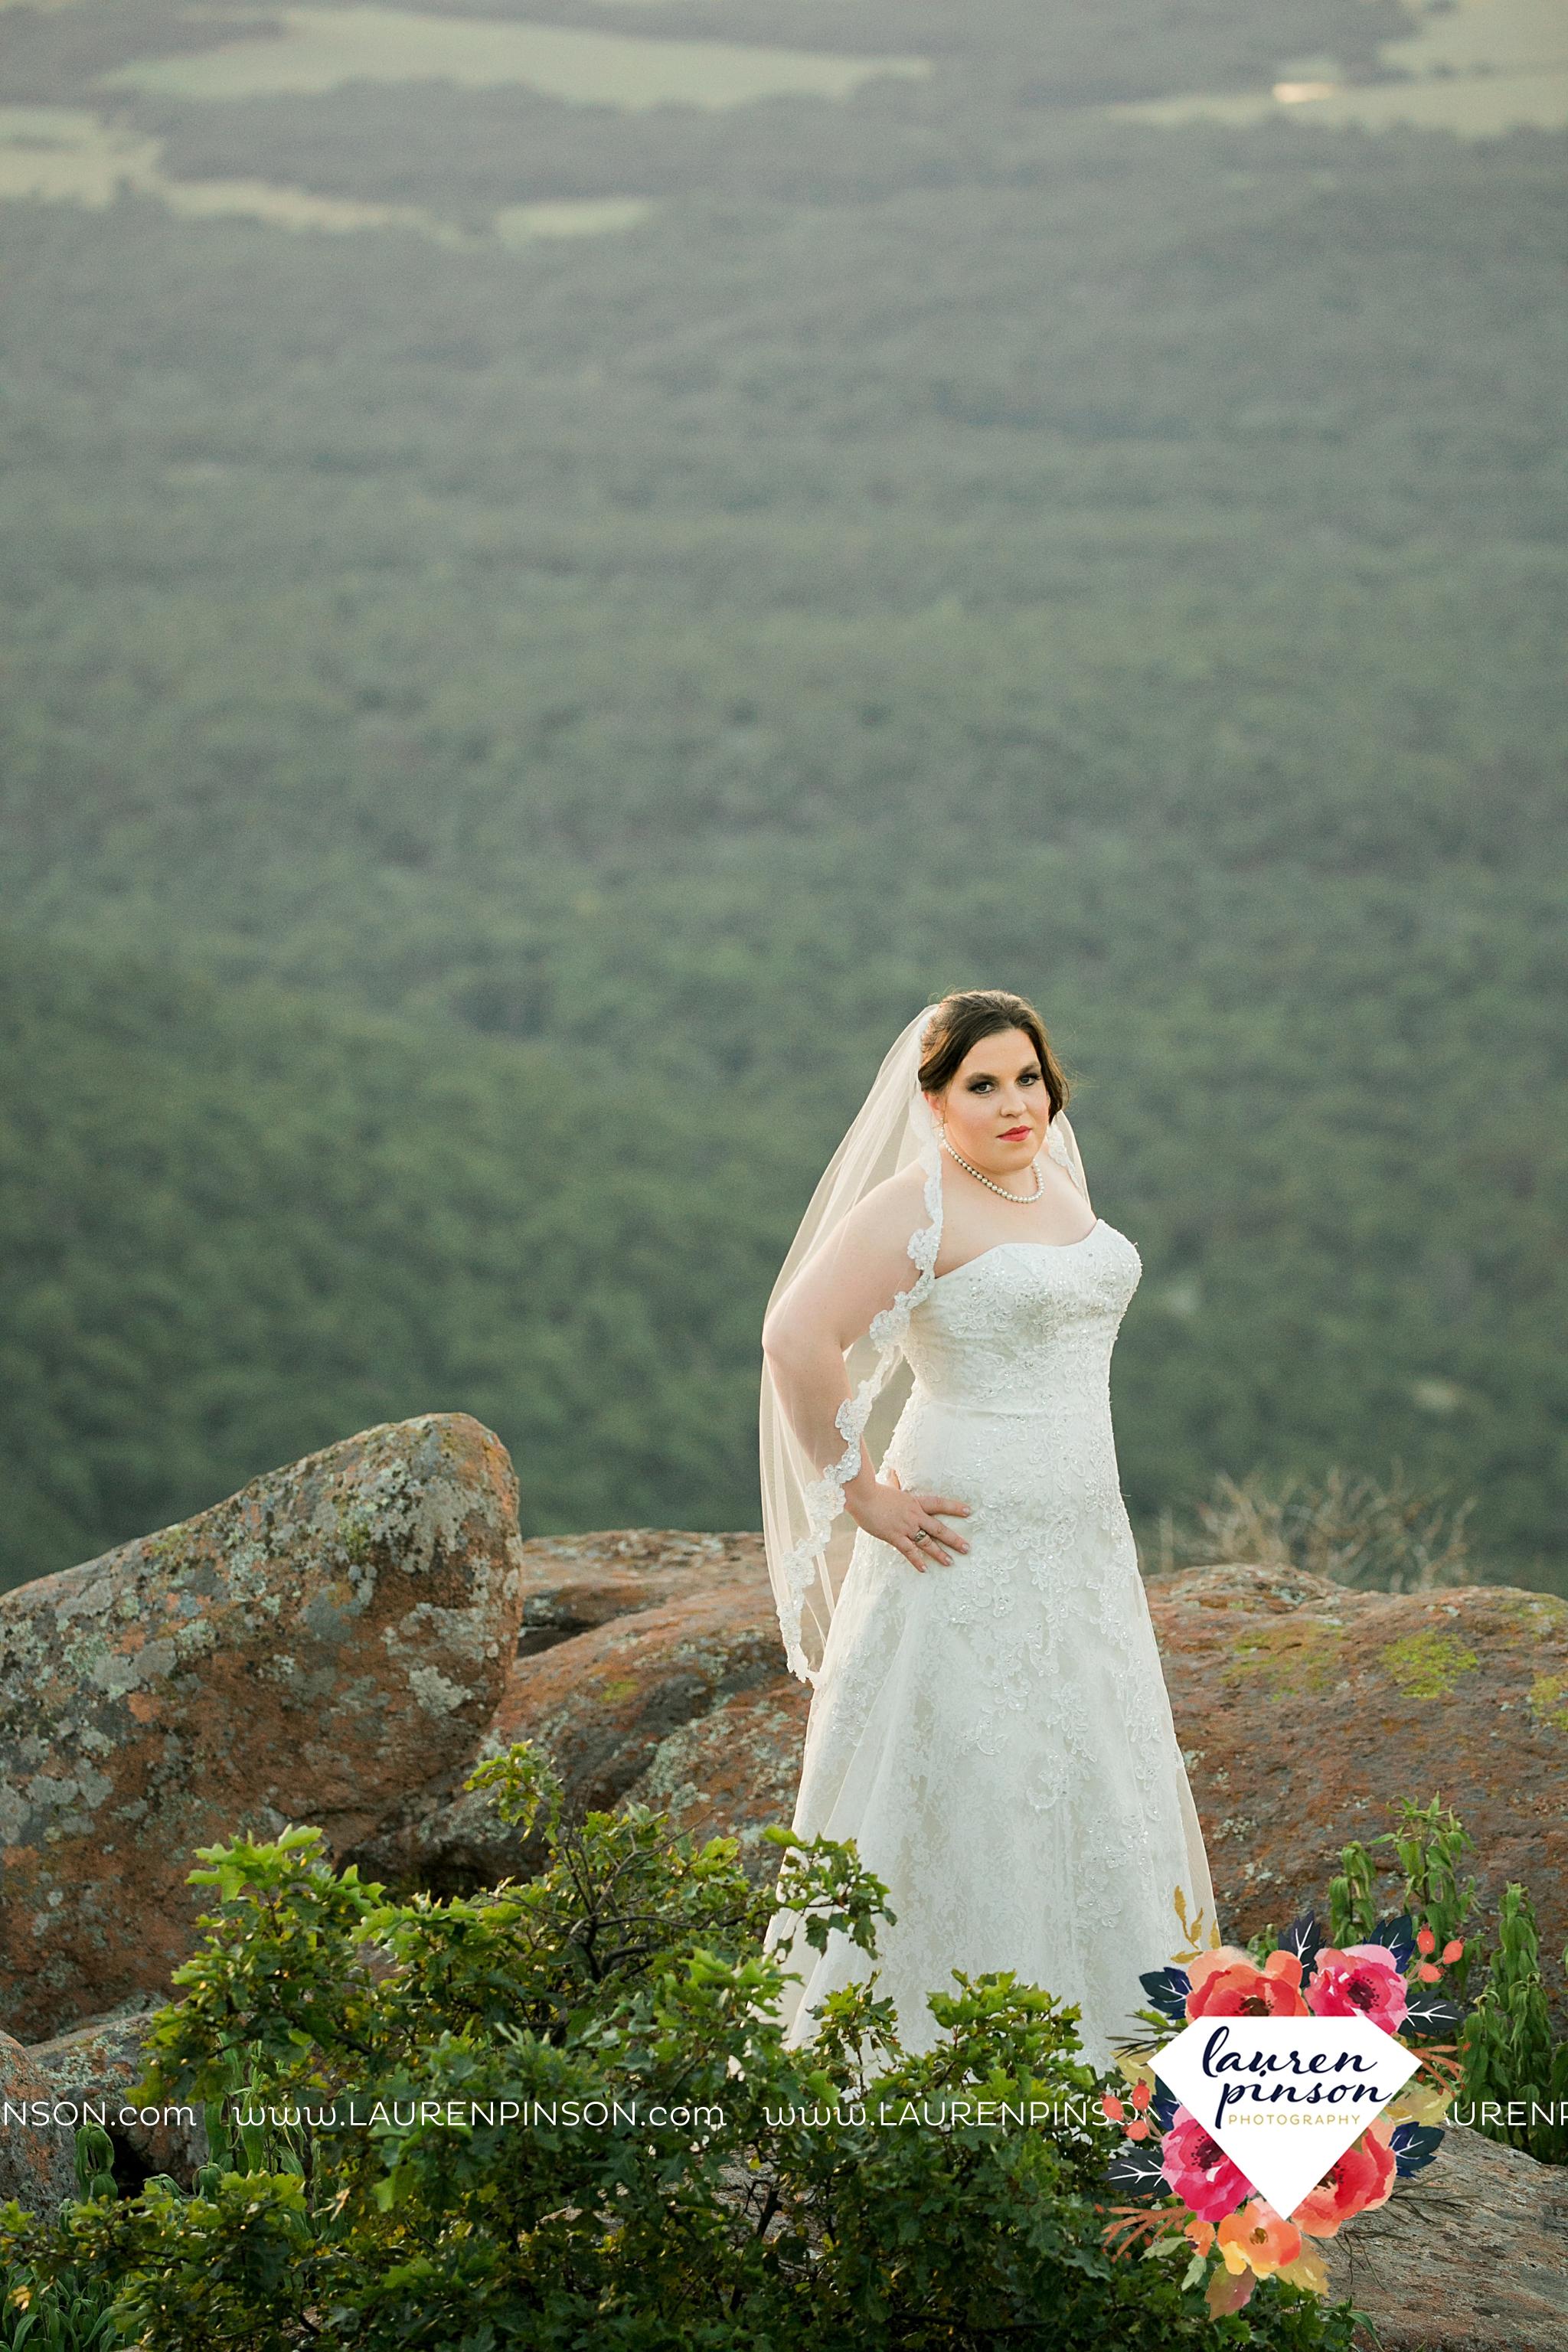 wichita-falls-texas-walters-lawton-oklahoma-wedding-photographer-wichita-mountains-bridal-portraits_3176.jpg